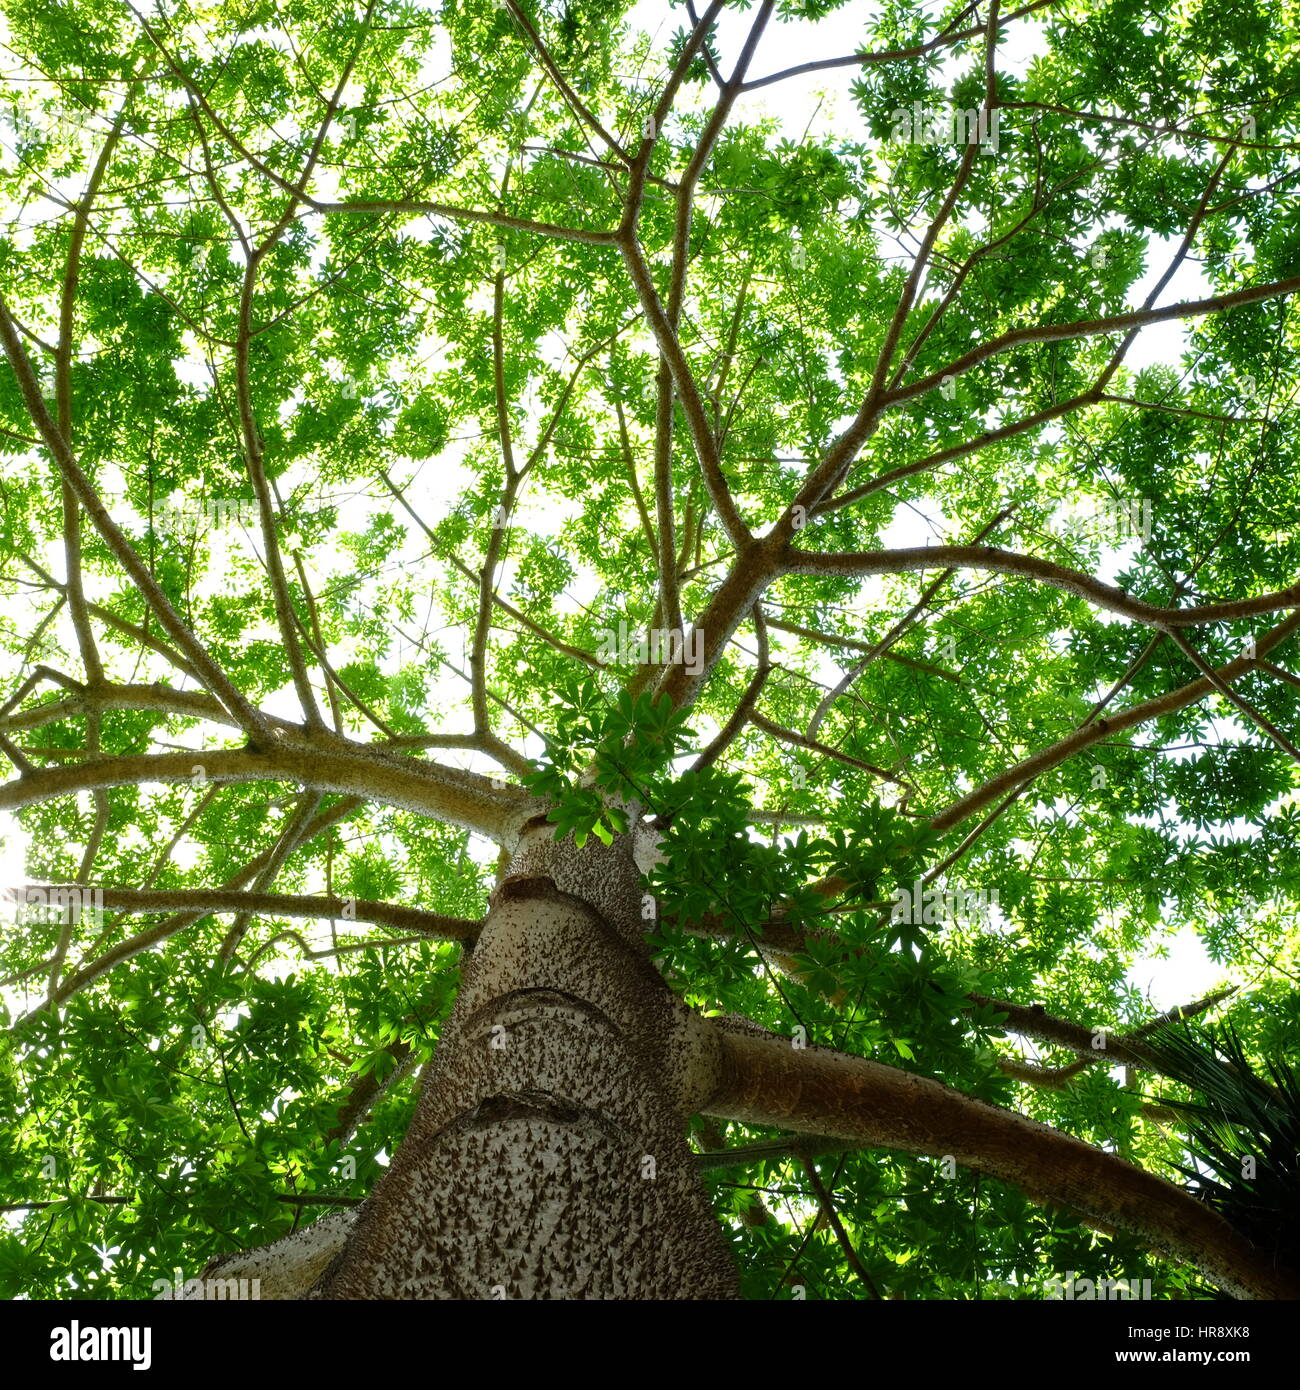 Tree canopy - Stock Image